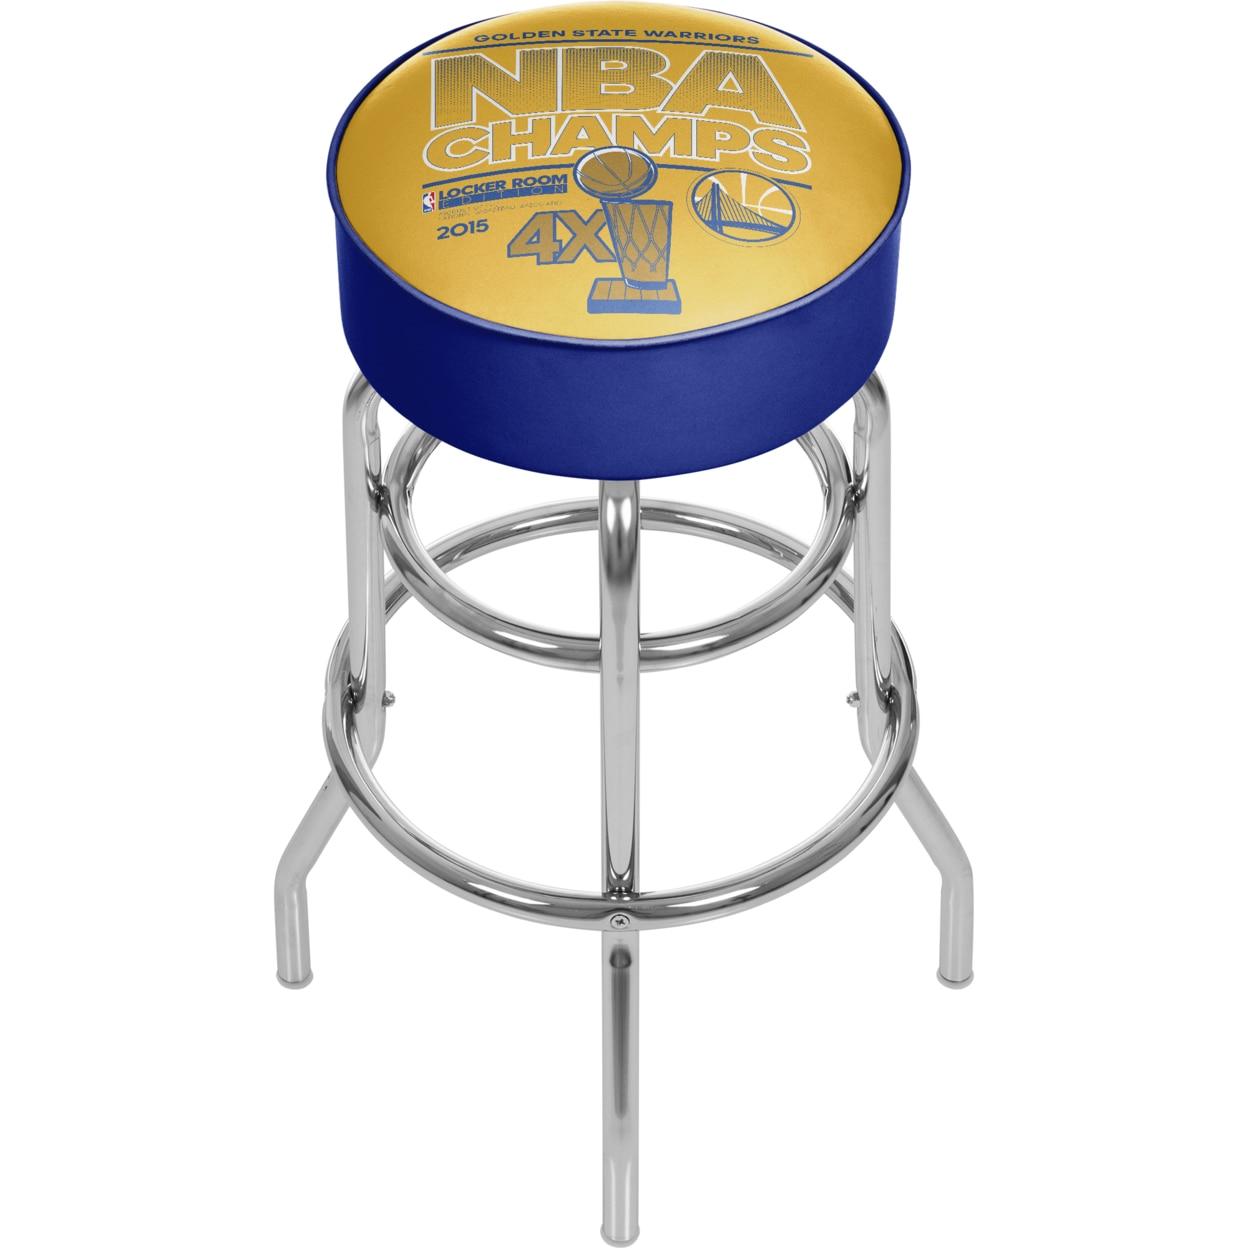 Golden State Warriors Chrome Bar Stool with Swivel - NBA Champs nikko машина nissan skyline gtr r34 street warriors 1 10 901584 в перми